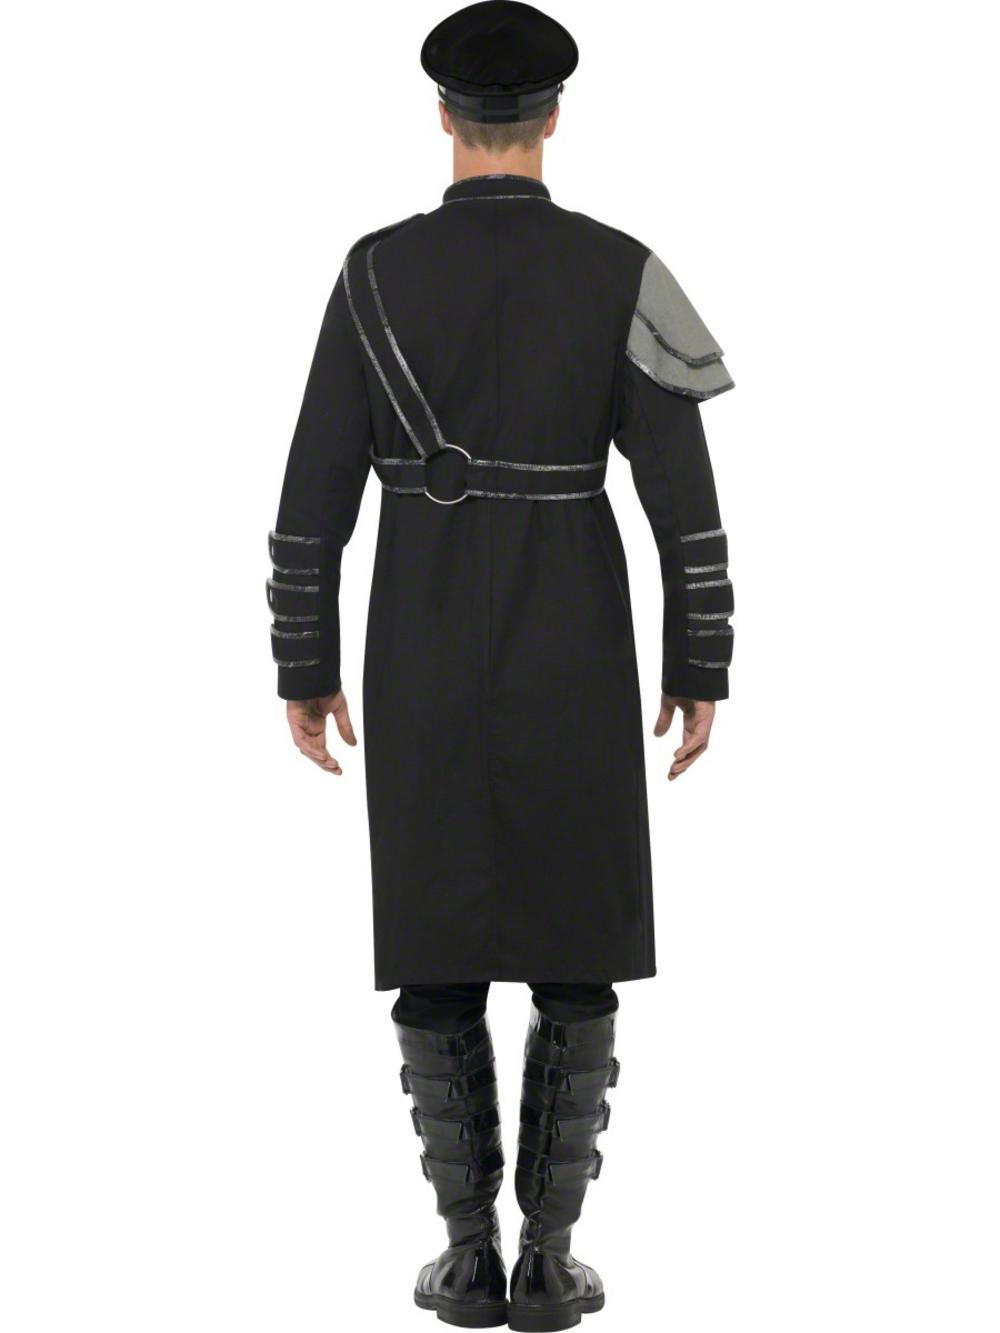 steam punk military man costume all mens halloween